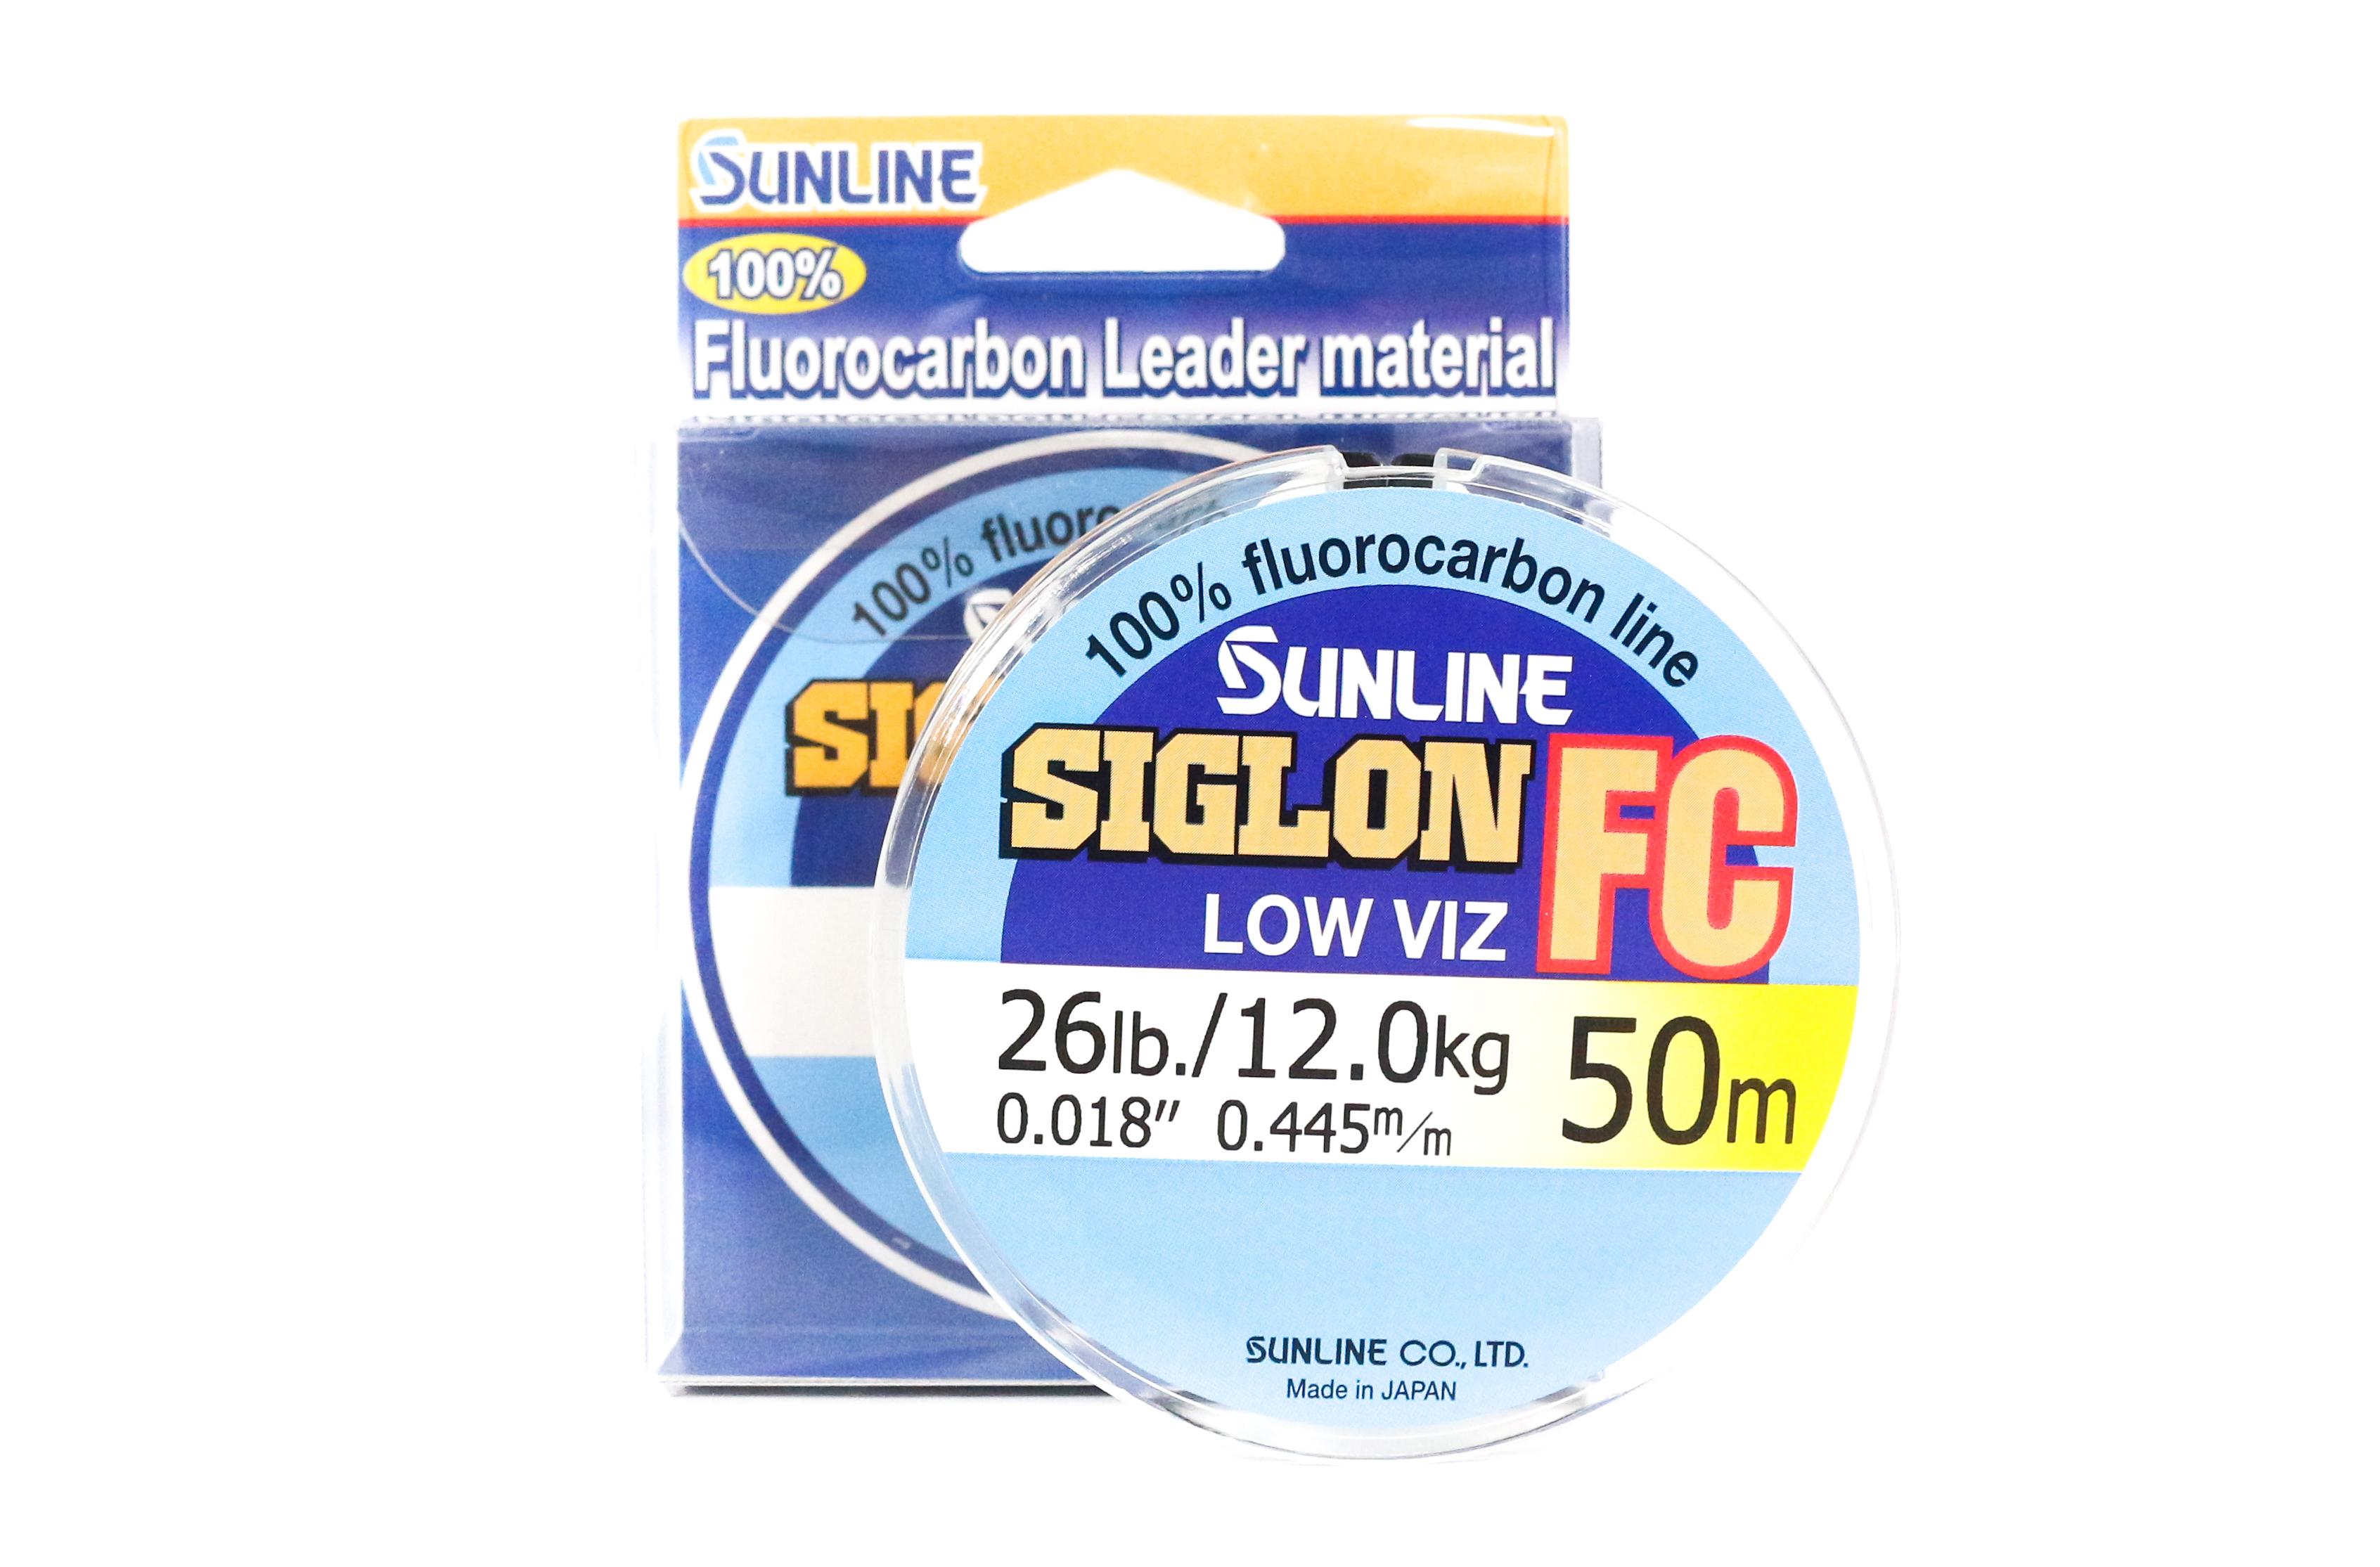 Sunline Siglon FC Fluorocarbon Line 50m 26lb Diameter 0.445 mm (5921)